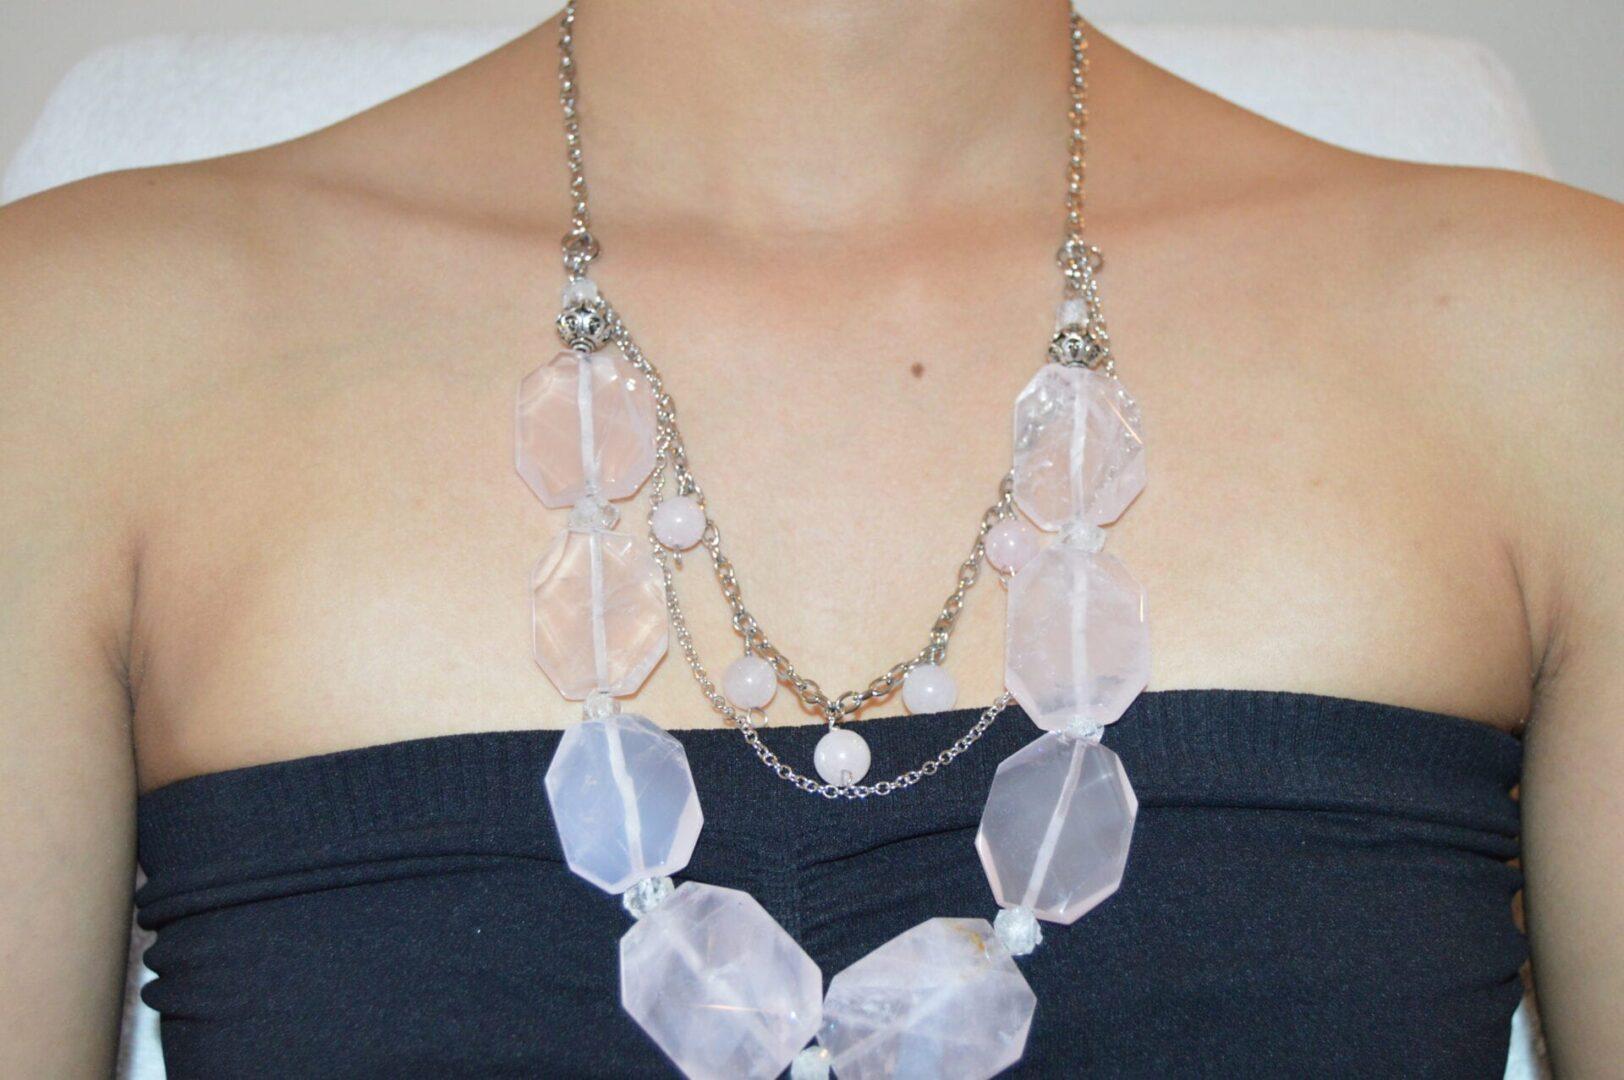 A Love Rush Necklace being worn around the neck